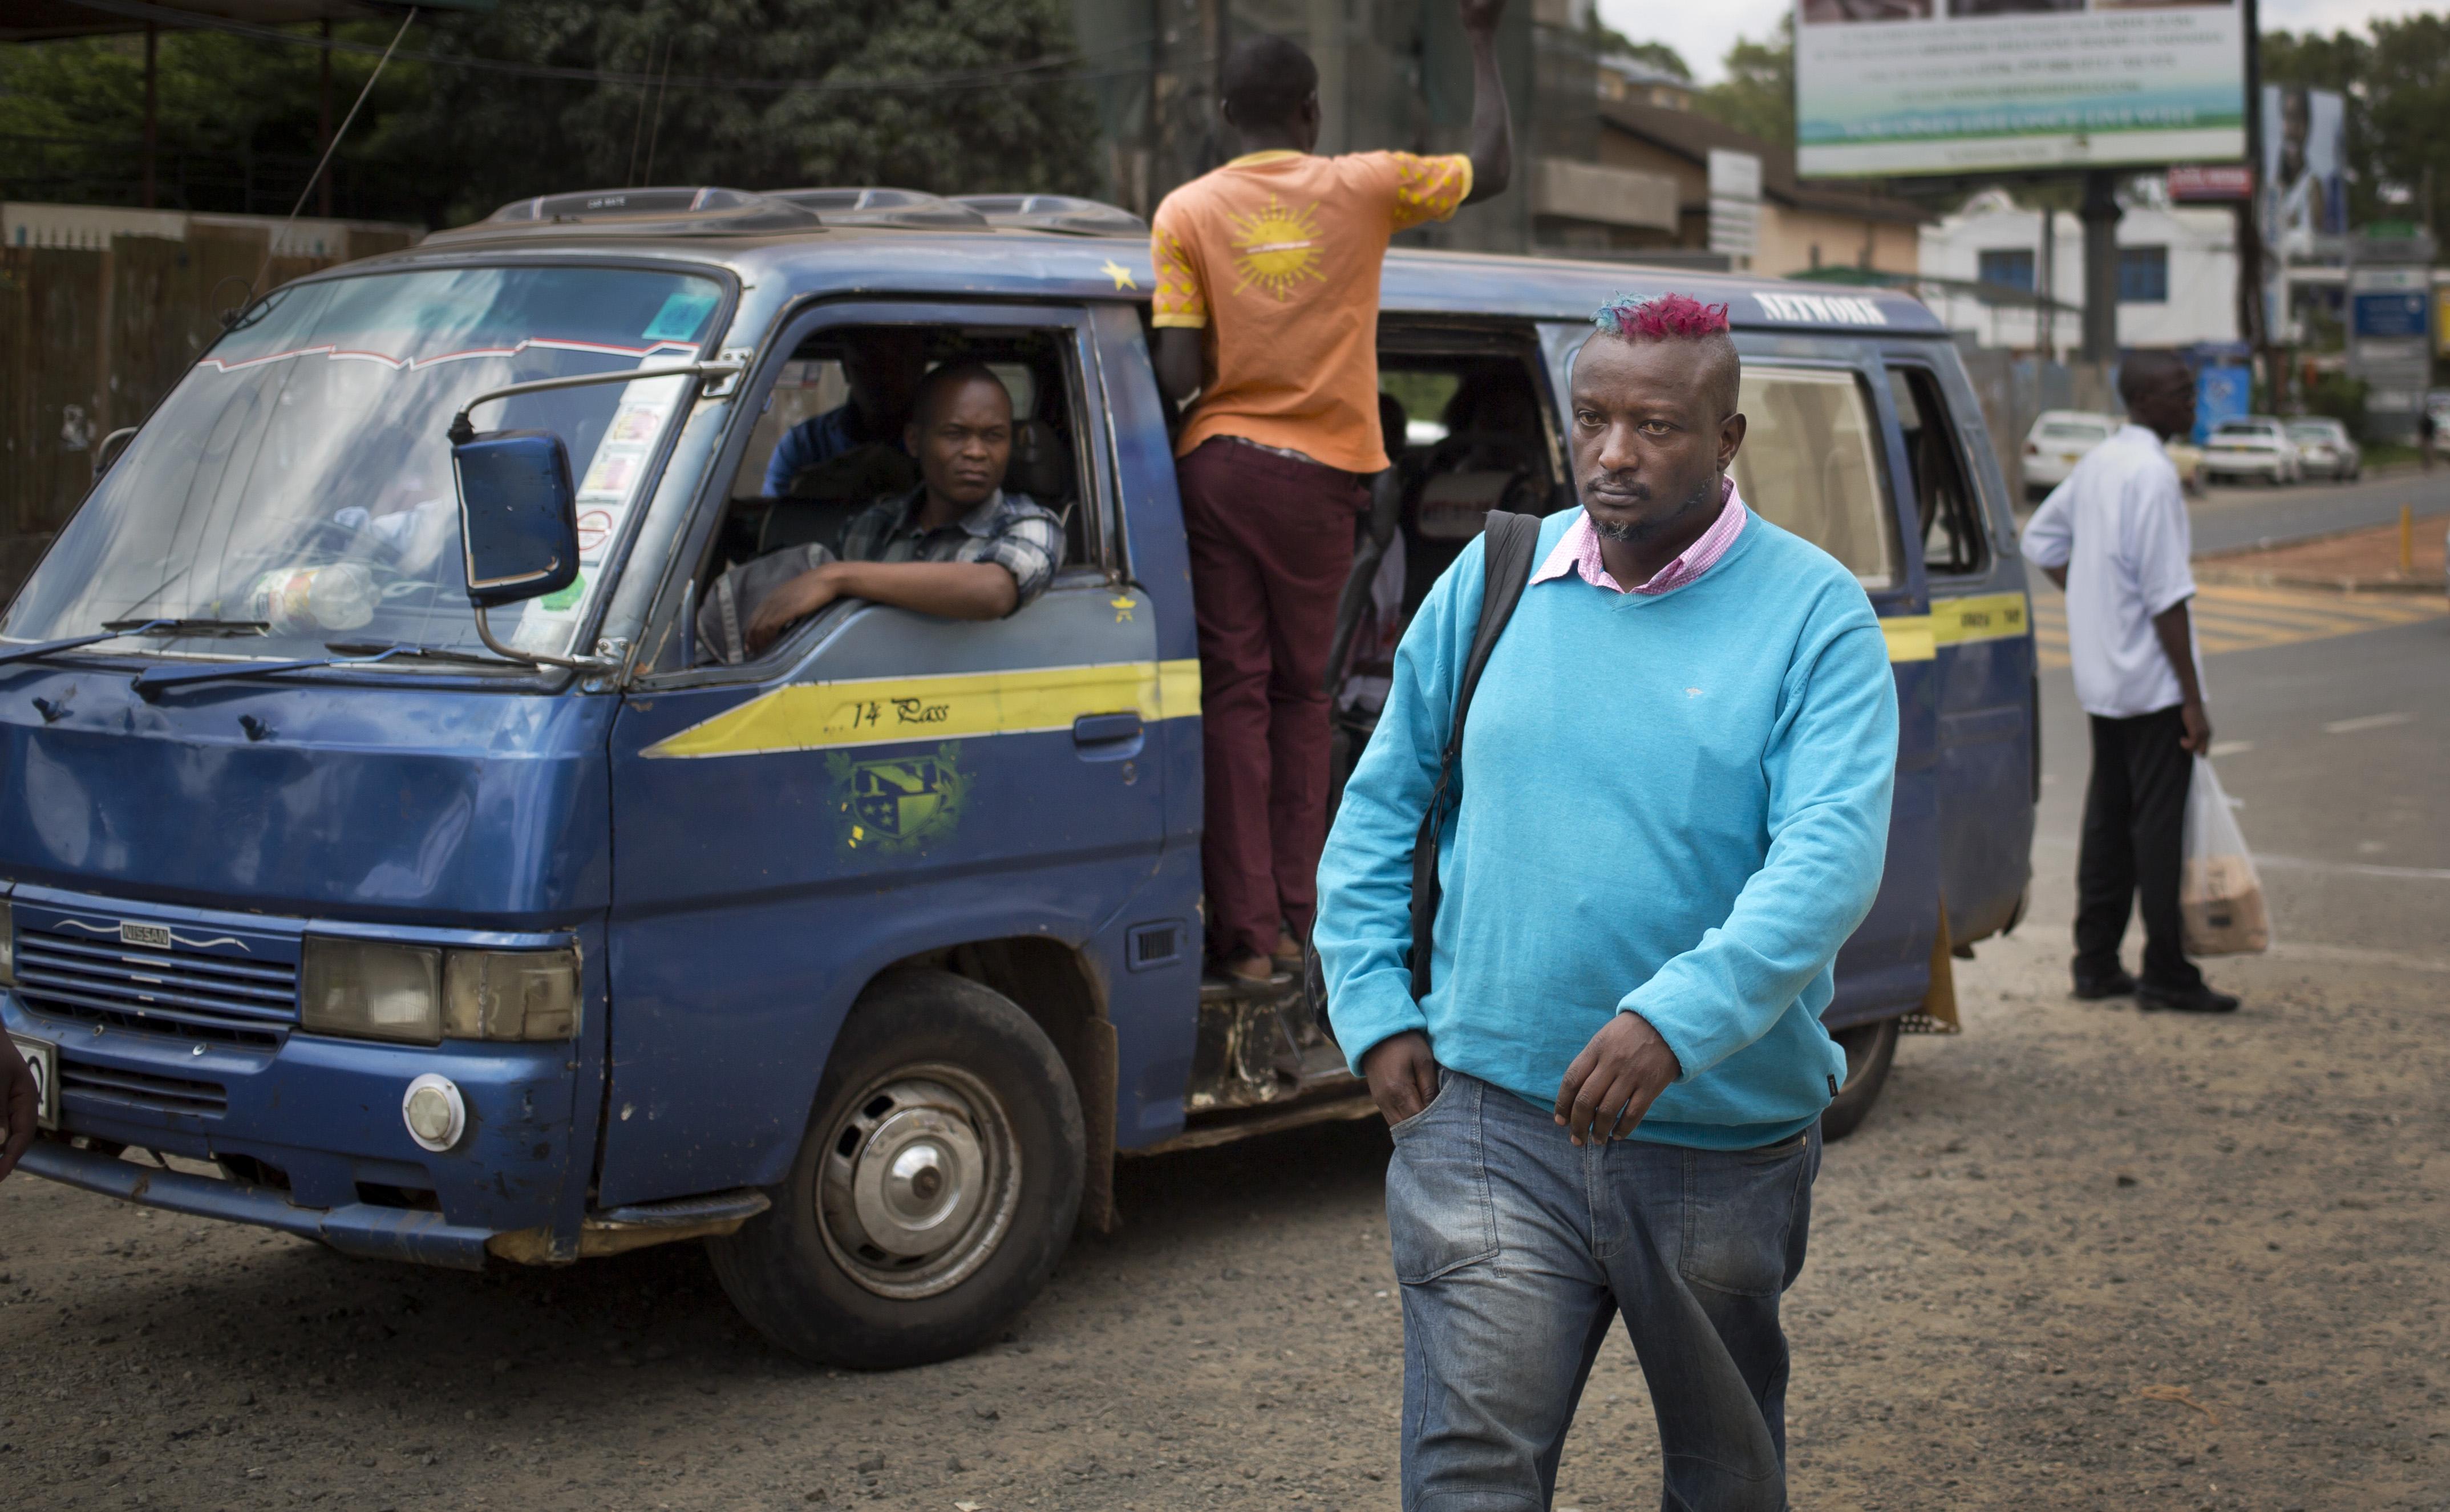 Prize-winning Kenyan author Binyavanga Wainaina walks down a street in Nairobi, Kenya Wednesday.